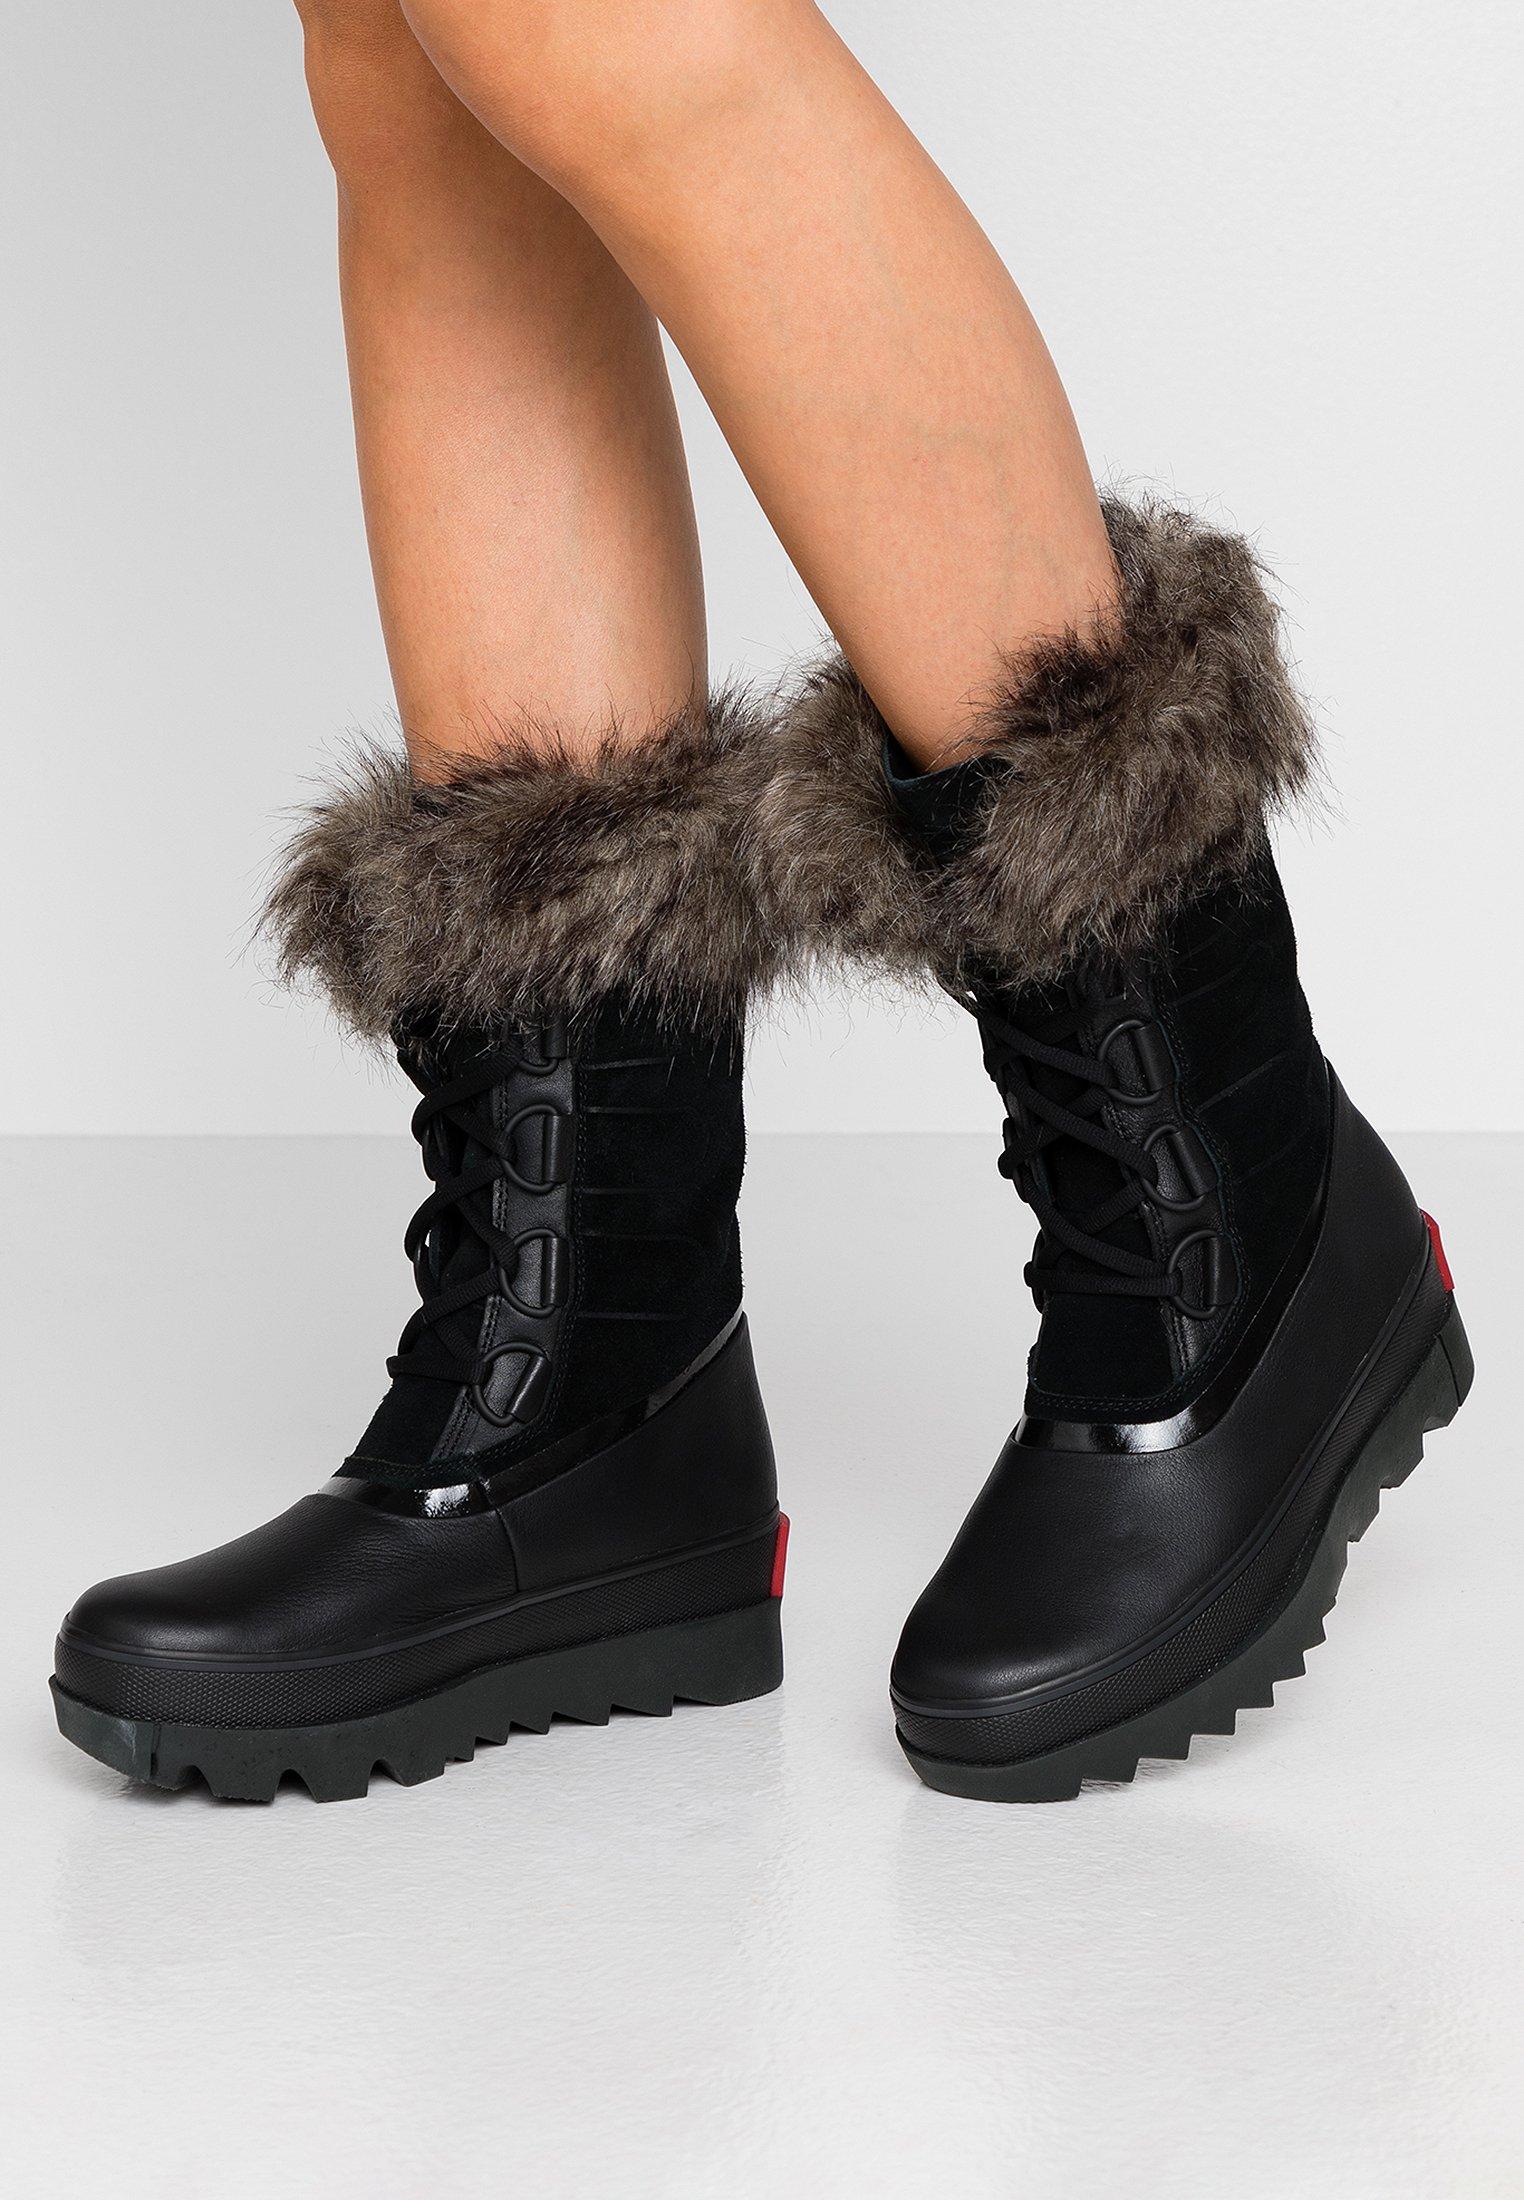 Sorel JOAN OF ARCTIC NEXT - Bottes de neige black